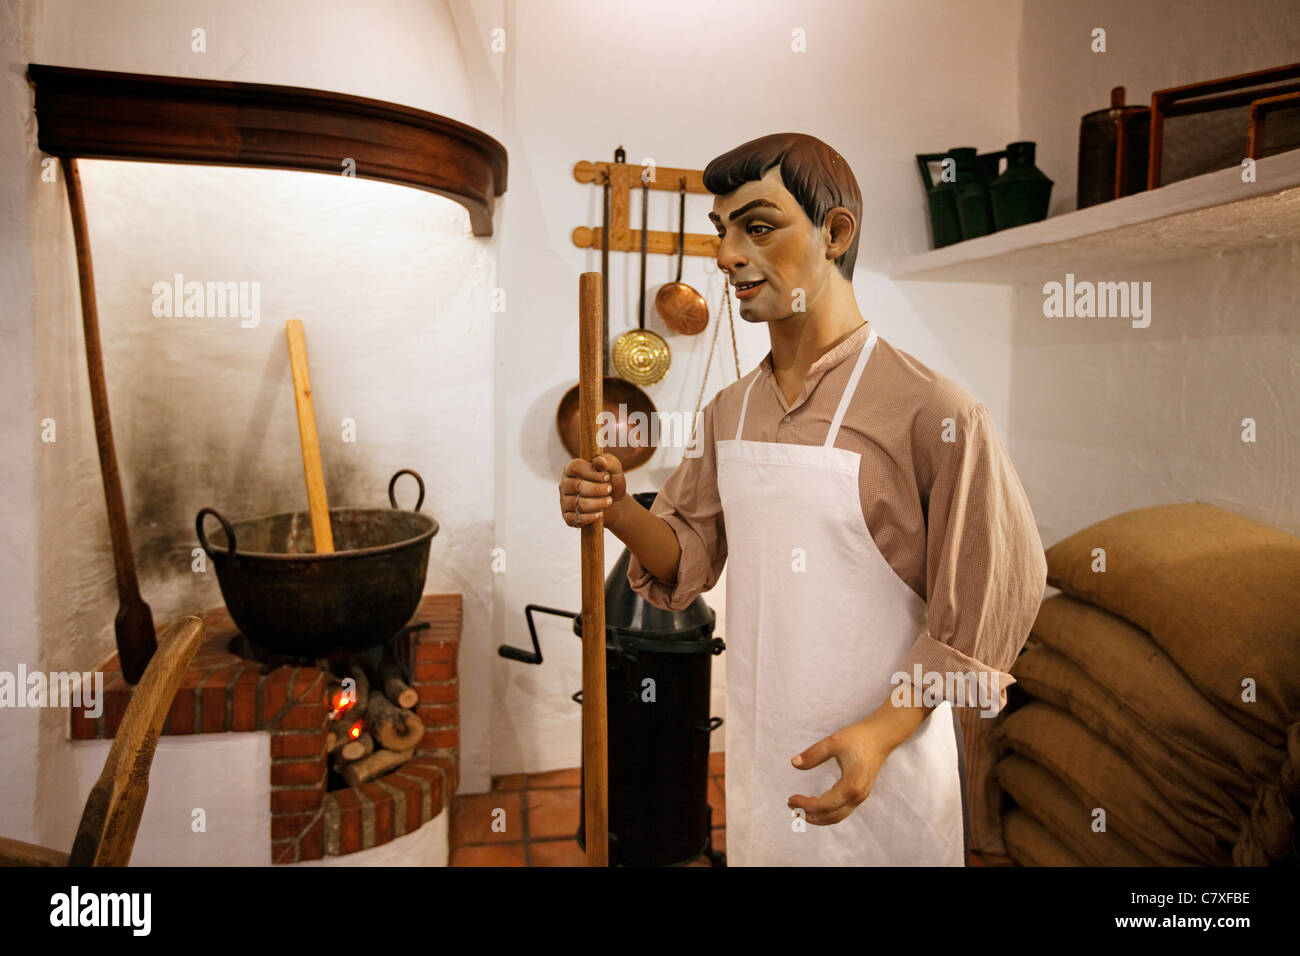 Museum of artisan mantecado Estepa Sevilla Andalusia Spain - Stock Image